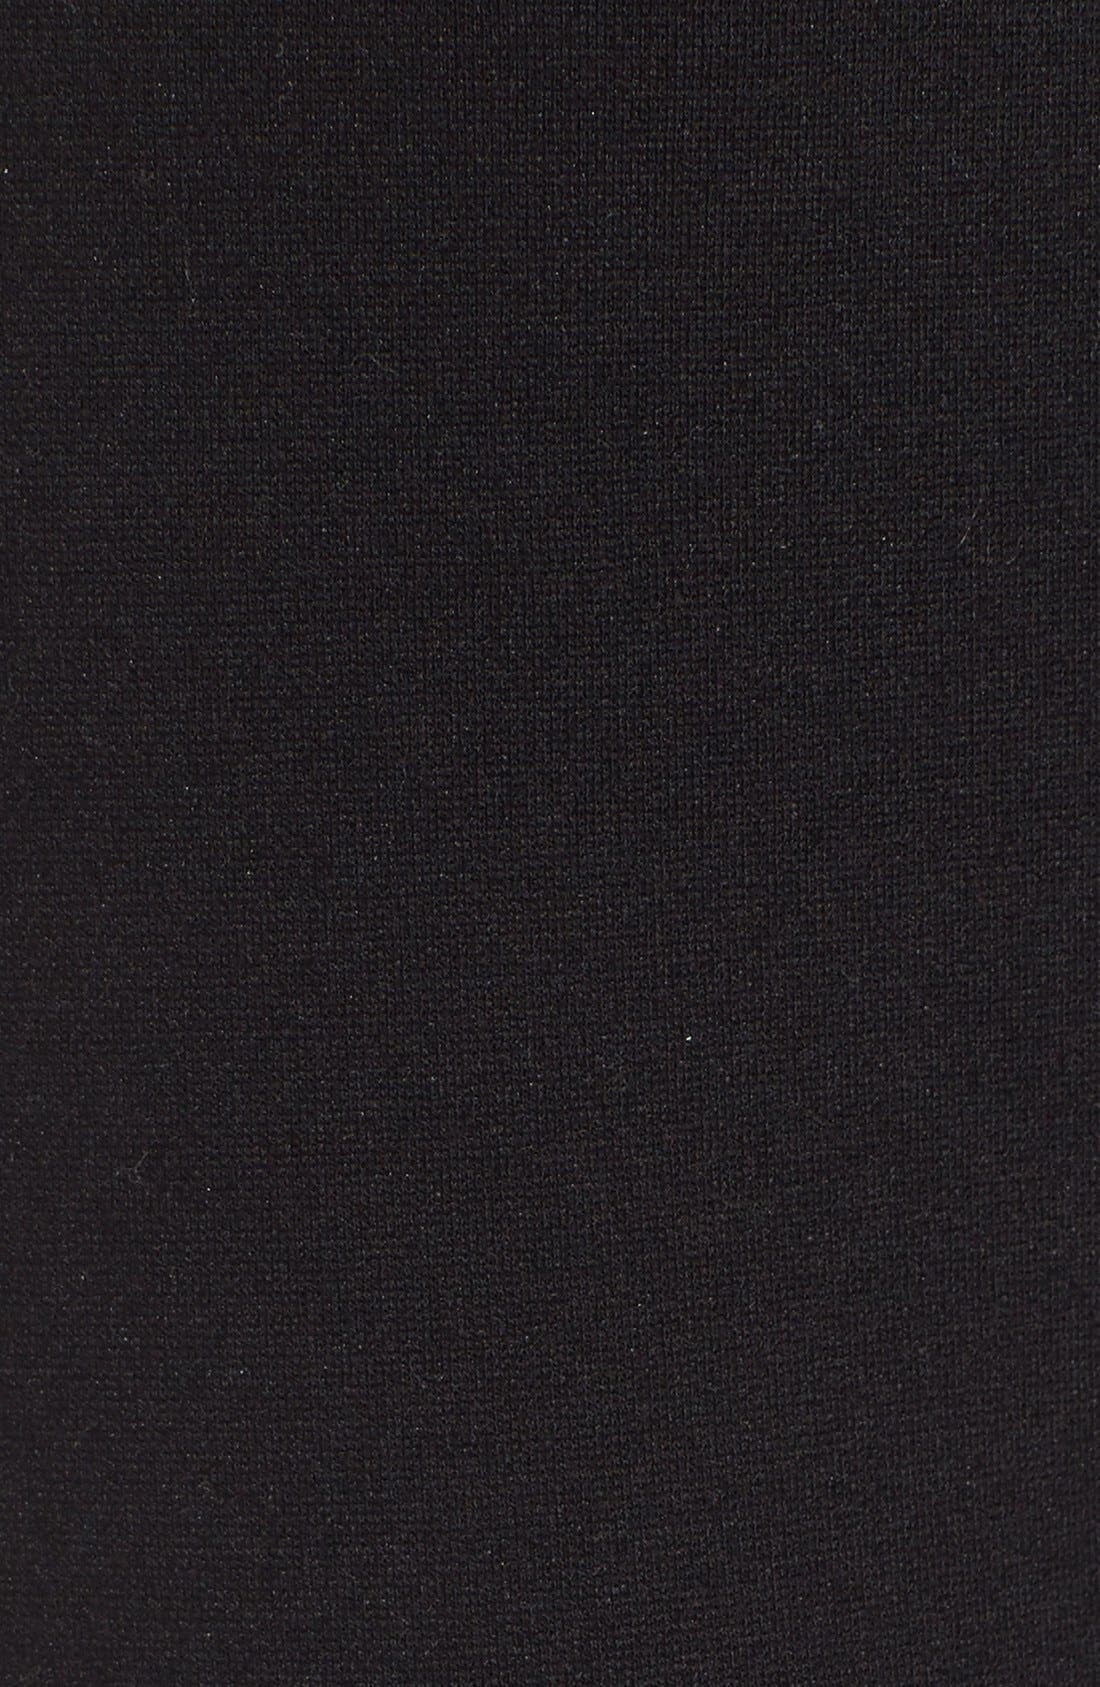 EILEEN FISHER, Slim Ponte Knit Pants, Alternate thumbnail 2, color, BLACK